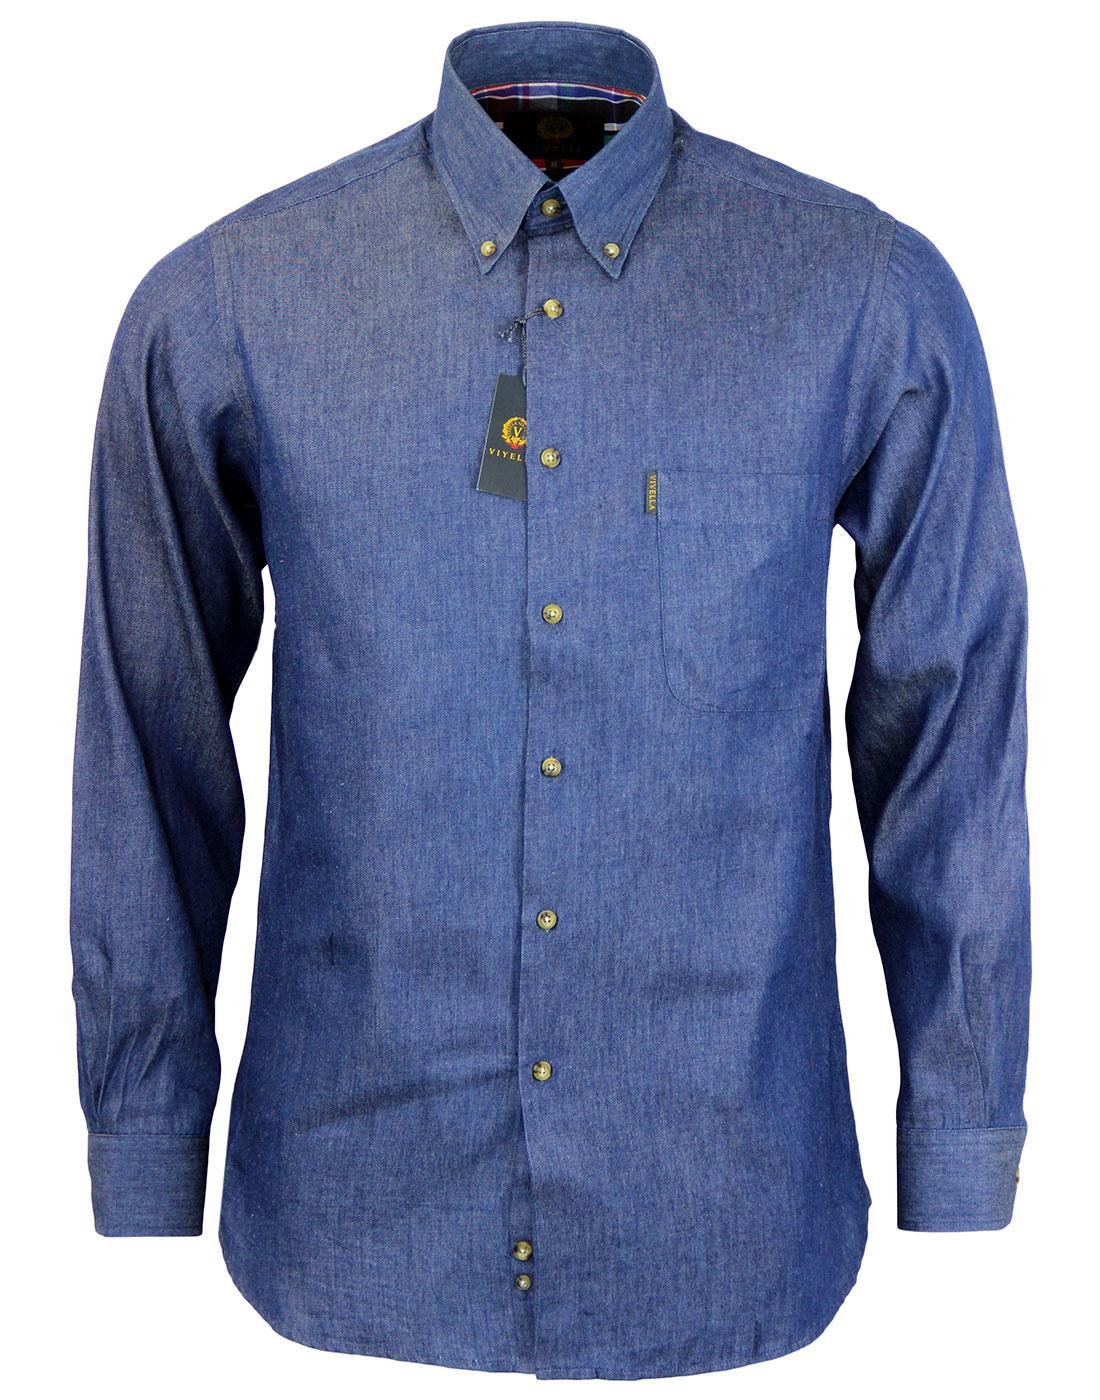 VIYELLA Retro Mod Classic Denim Button Down Shirt